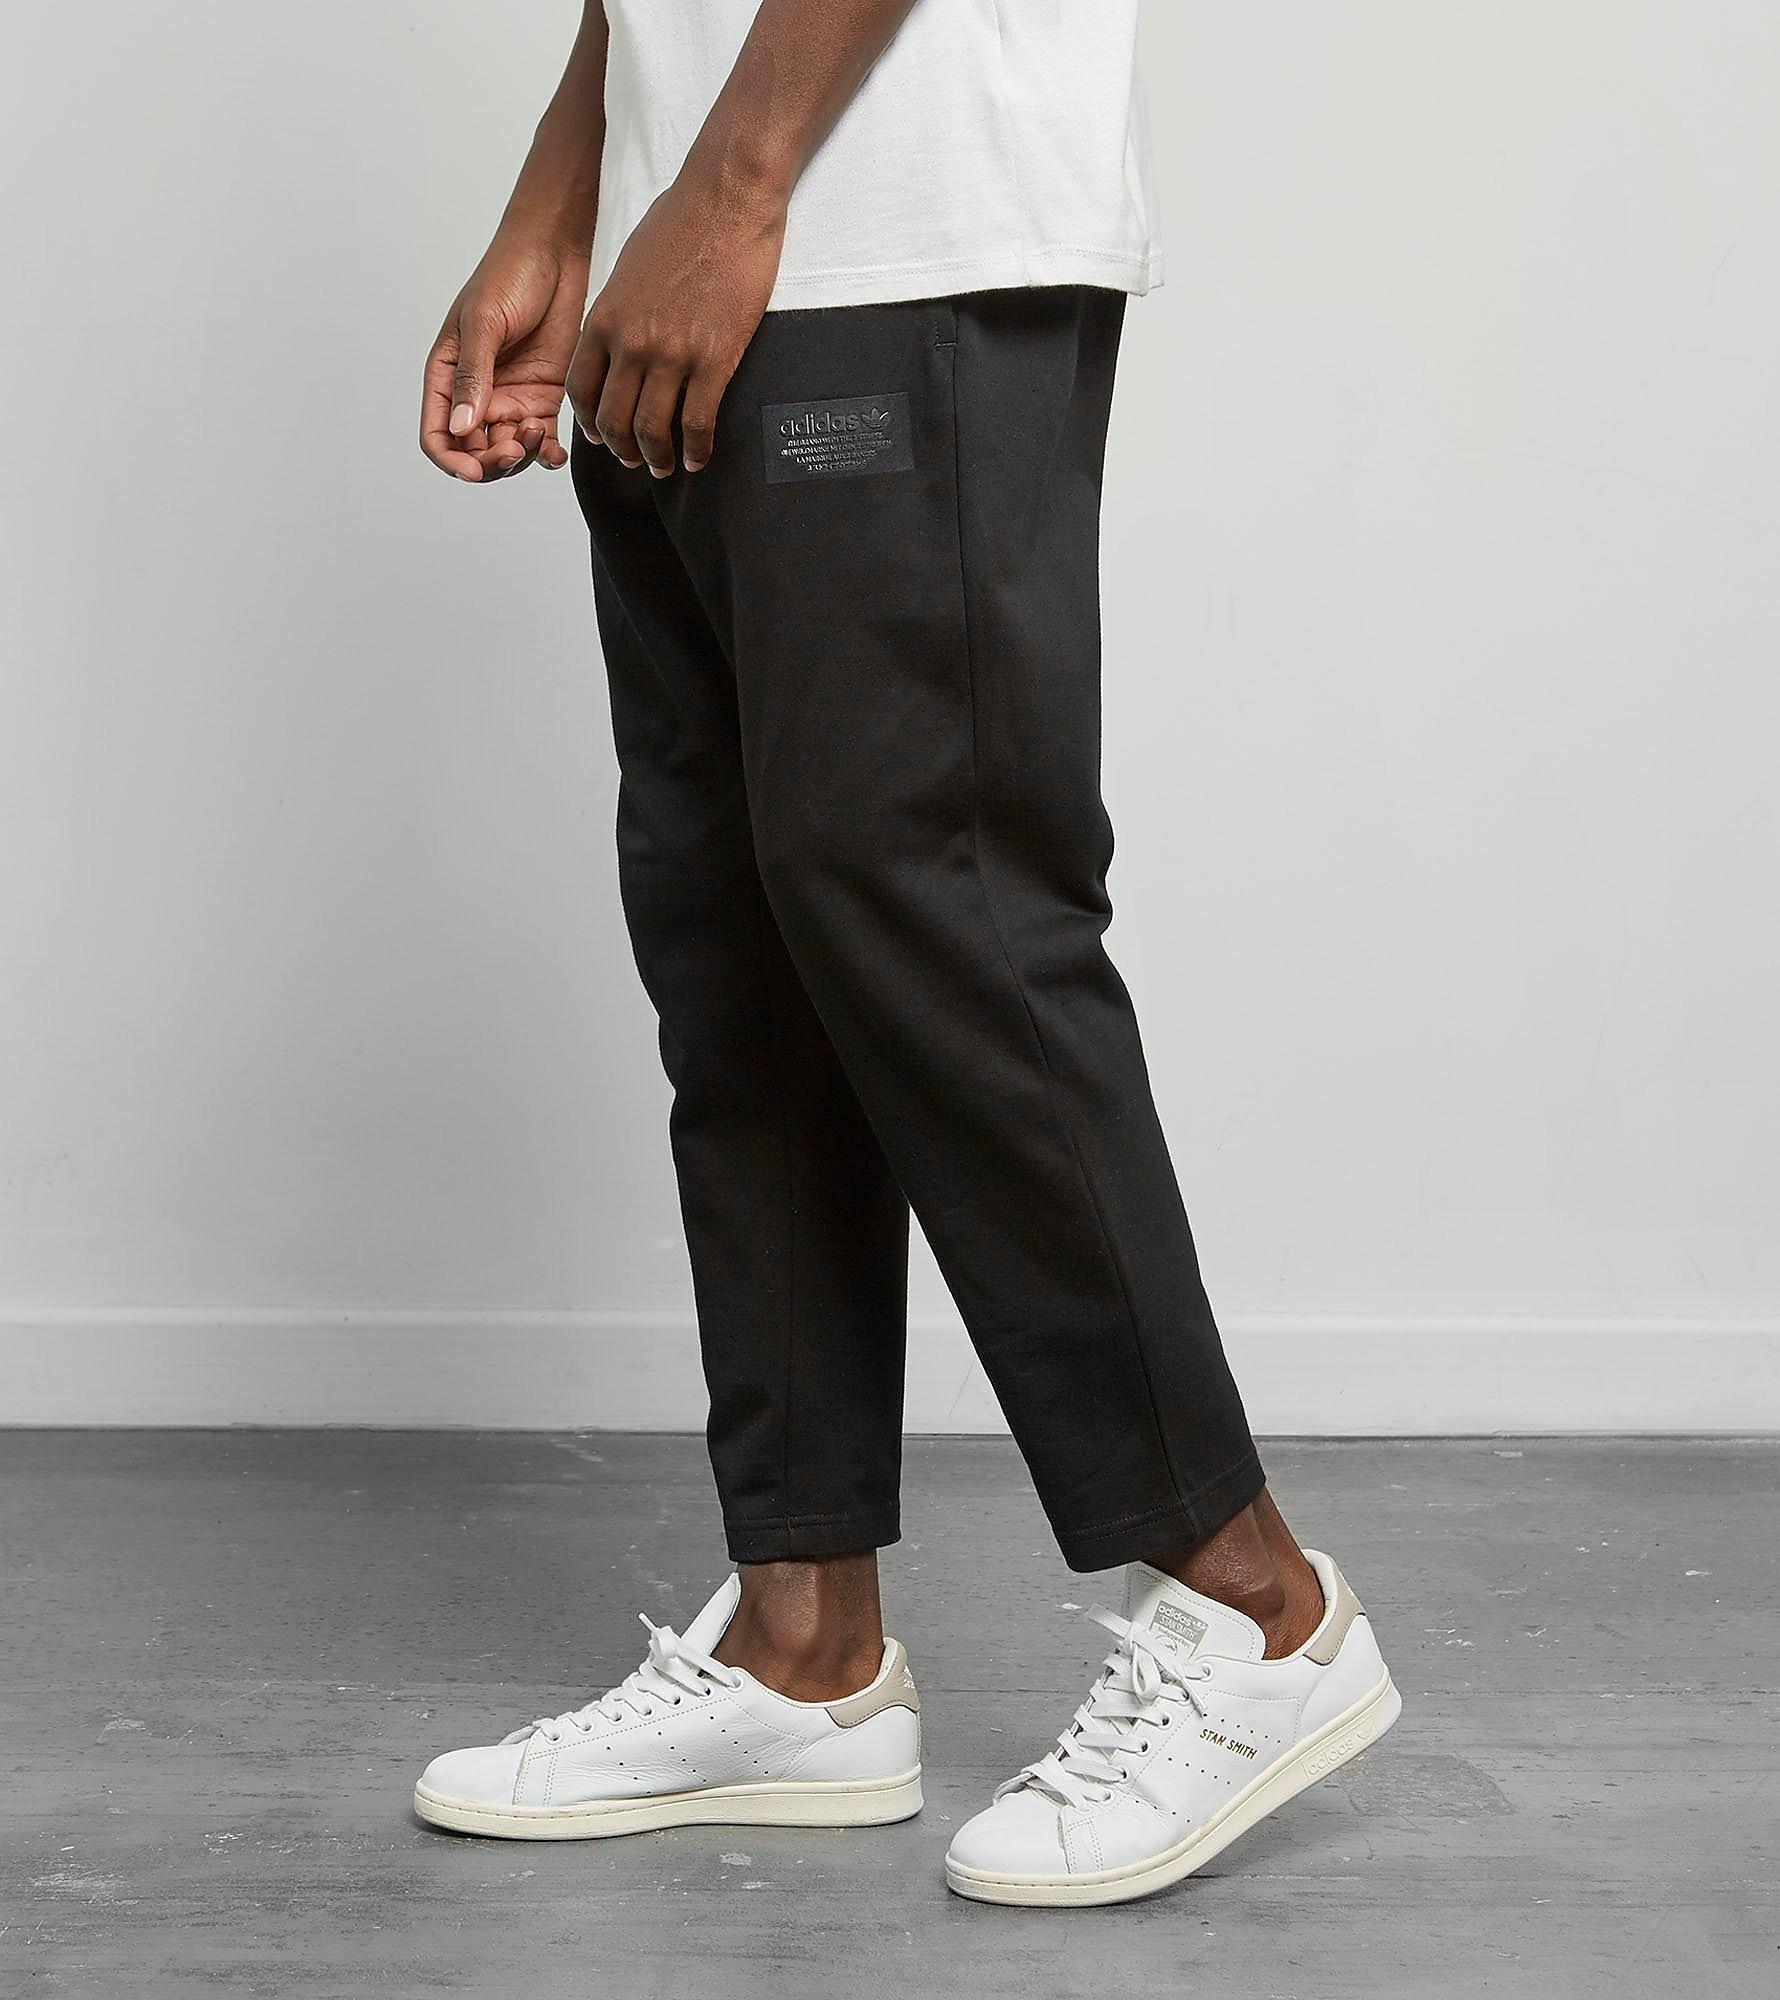 adidas Originals NMD Sweatpants